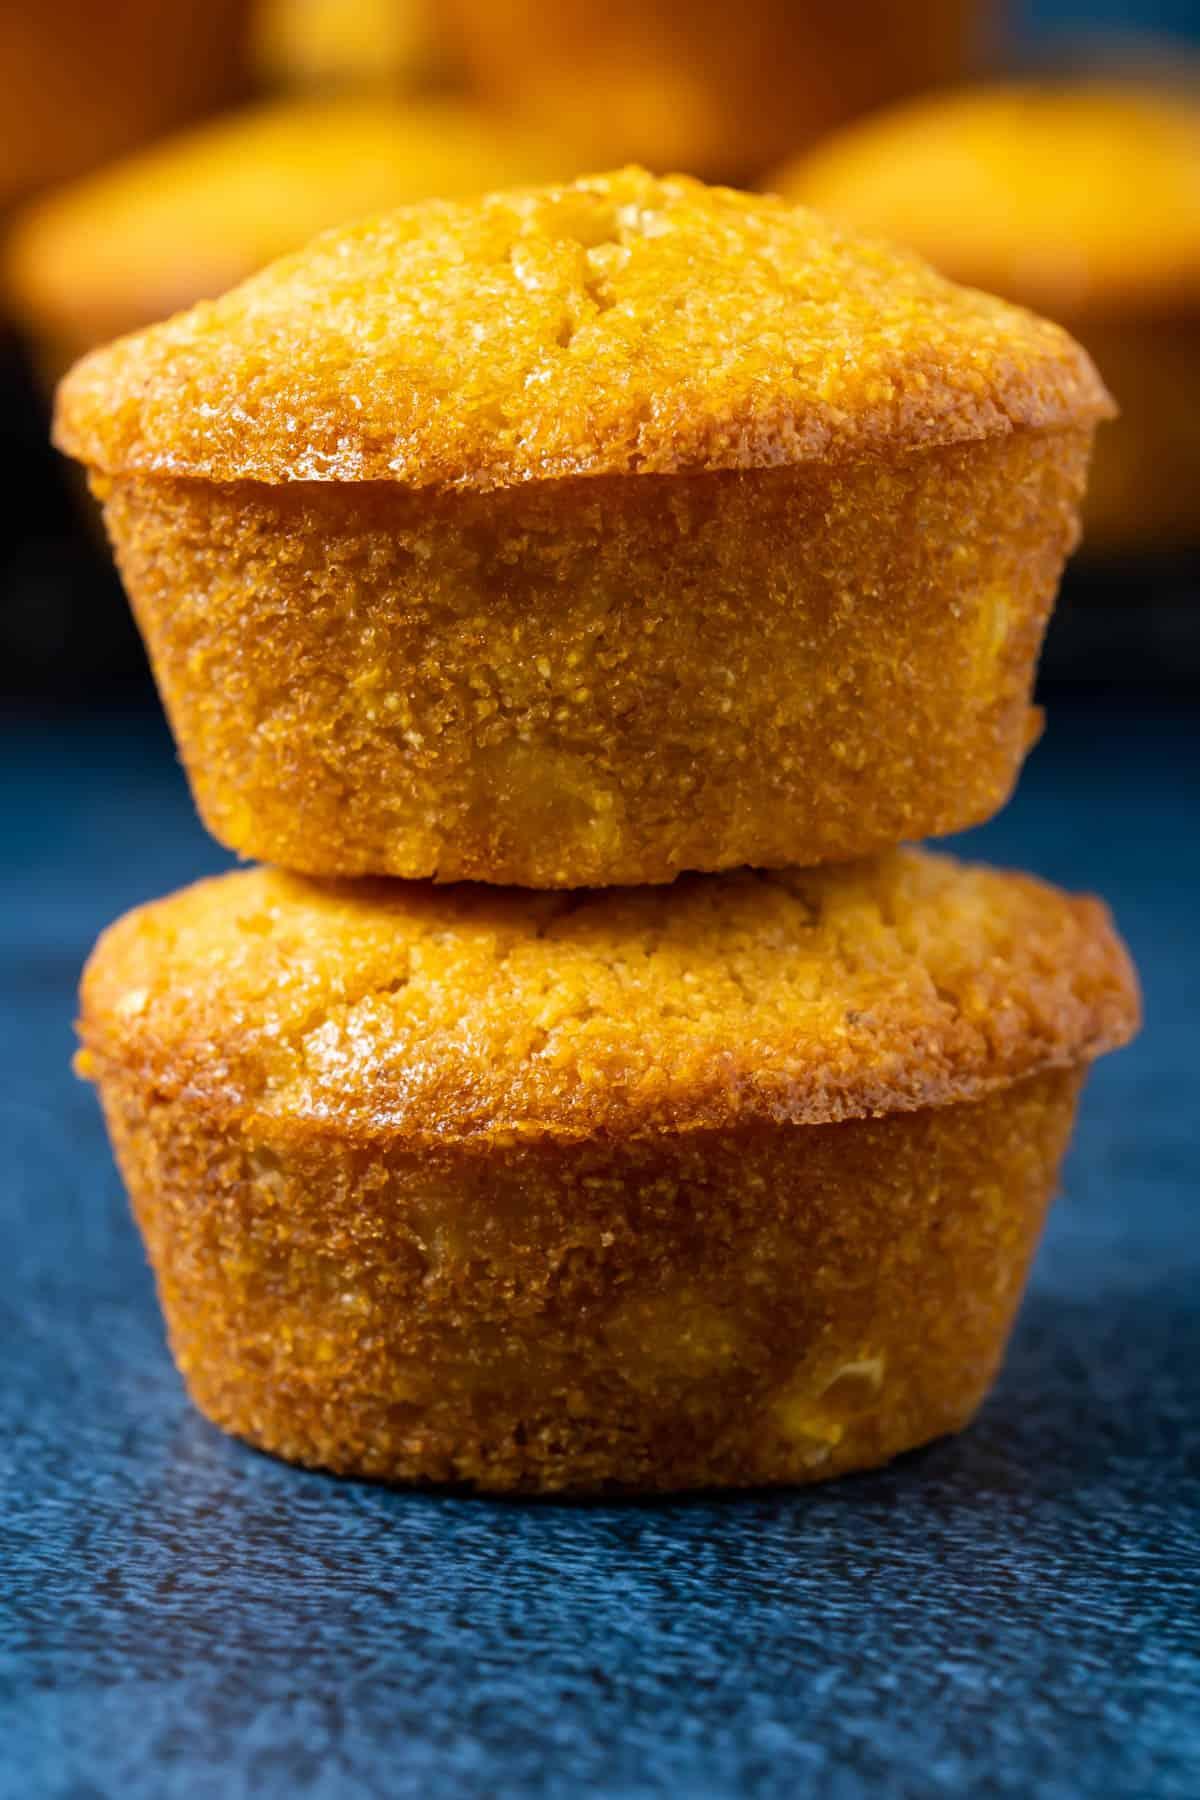 Stack of two vegan cornbread muffins